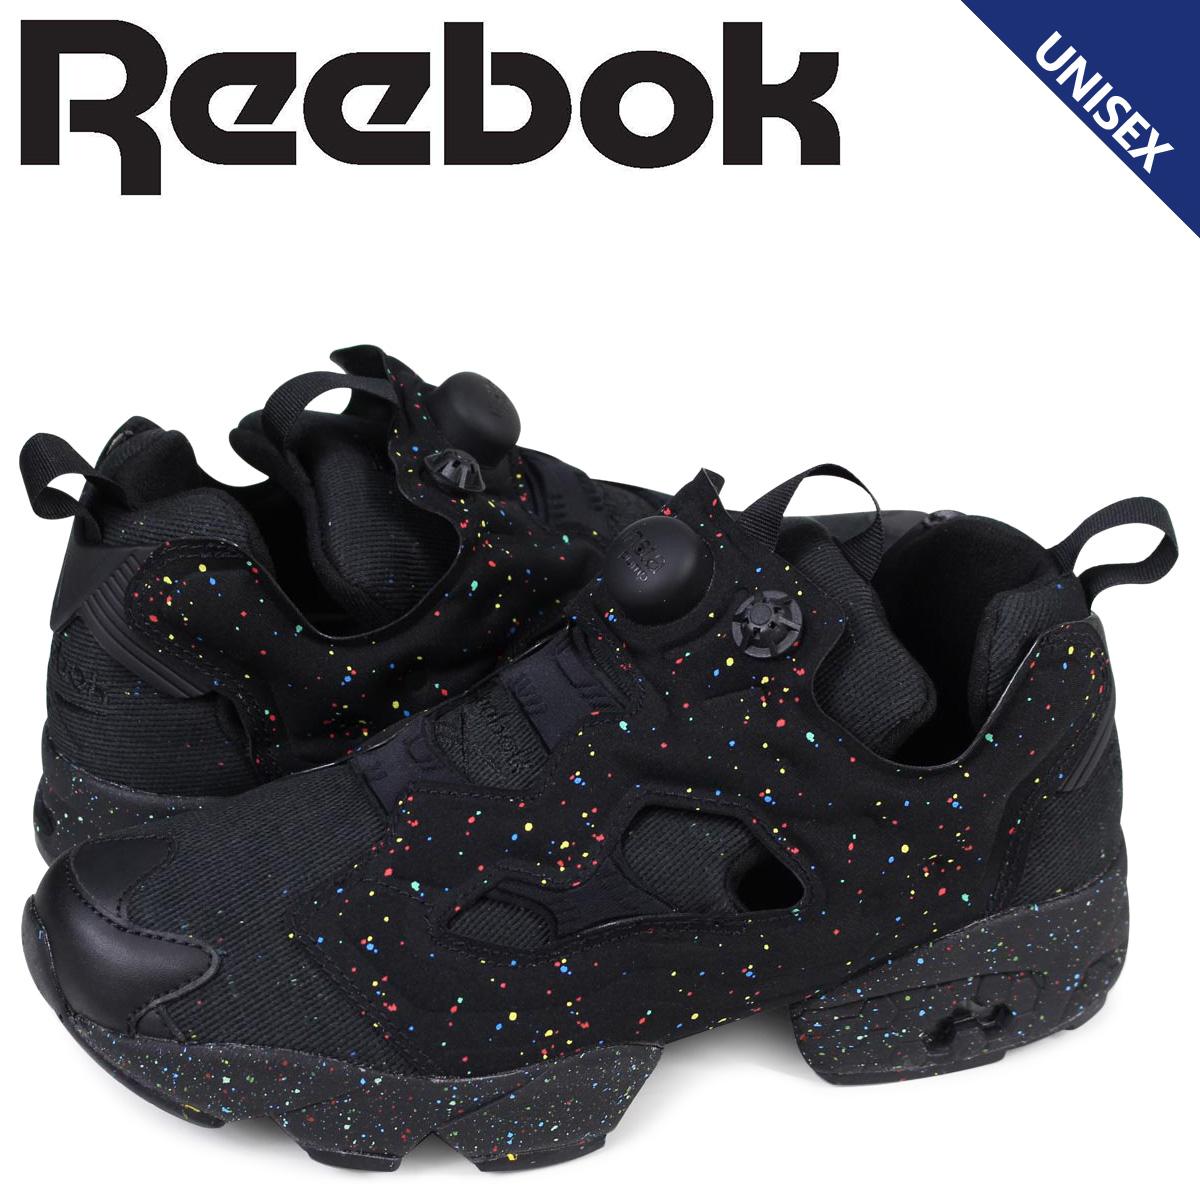 SneaK Online Shop | Rakuten Global Market: リーボックポンプフューリーメンズレディーススニーカー Reebok INSTAPUMP FURY OG CS CM9390 black [2/9 Shinnyu load]